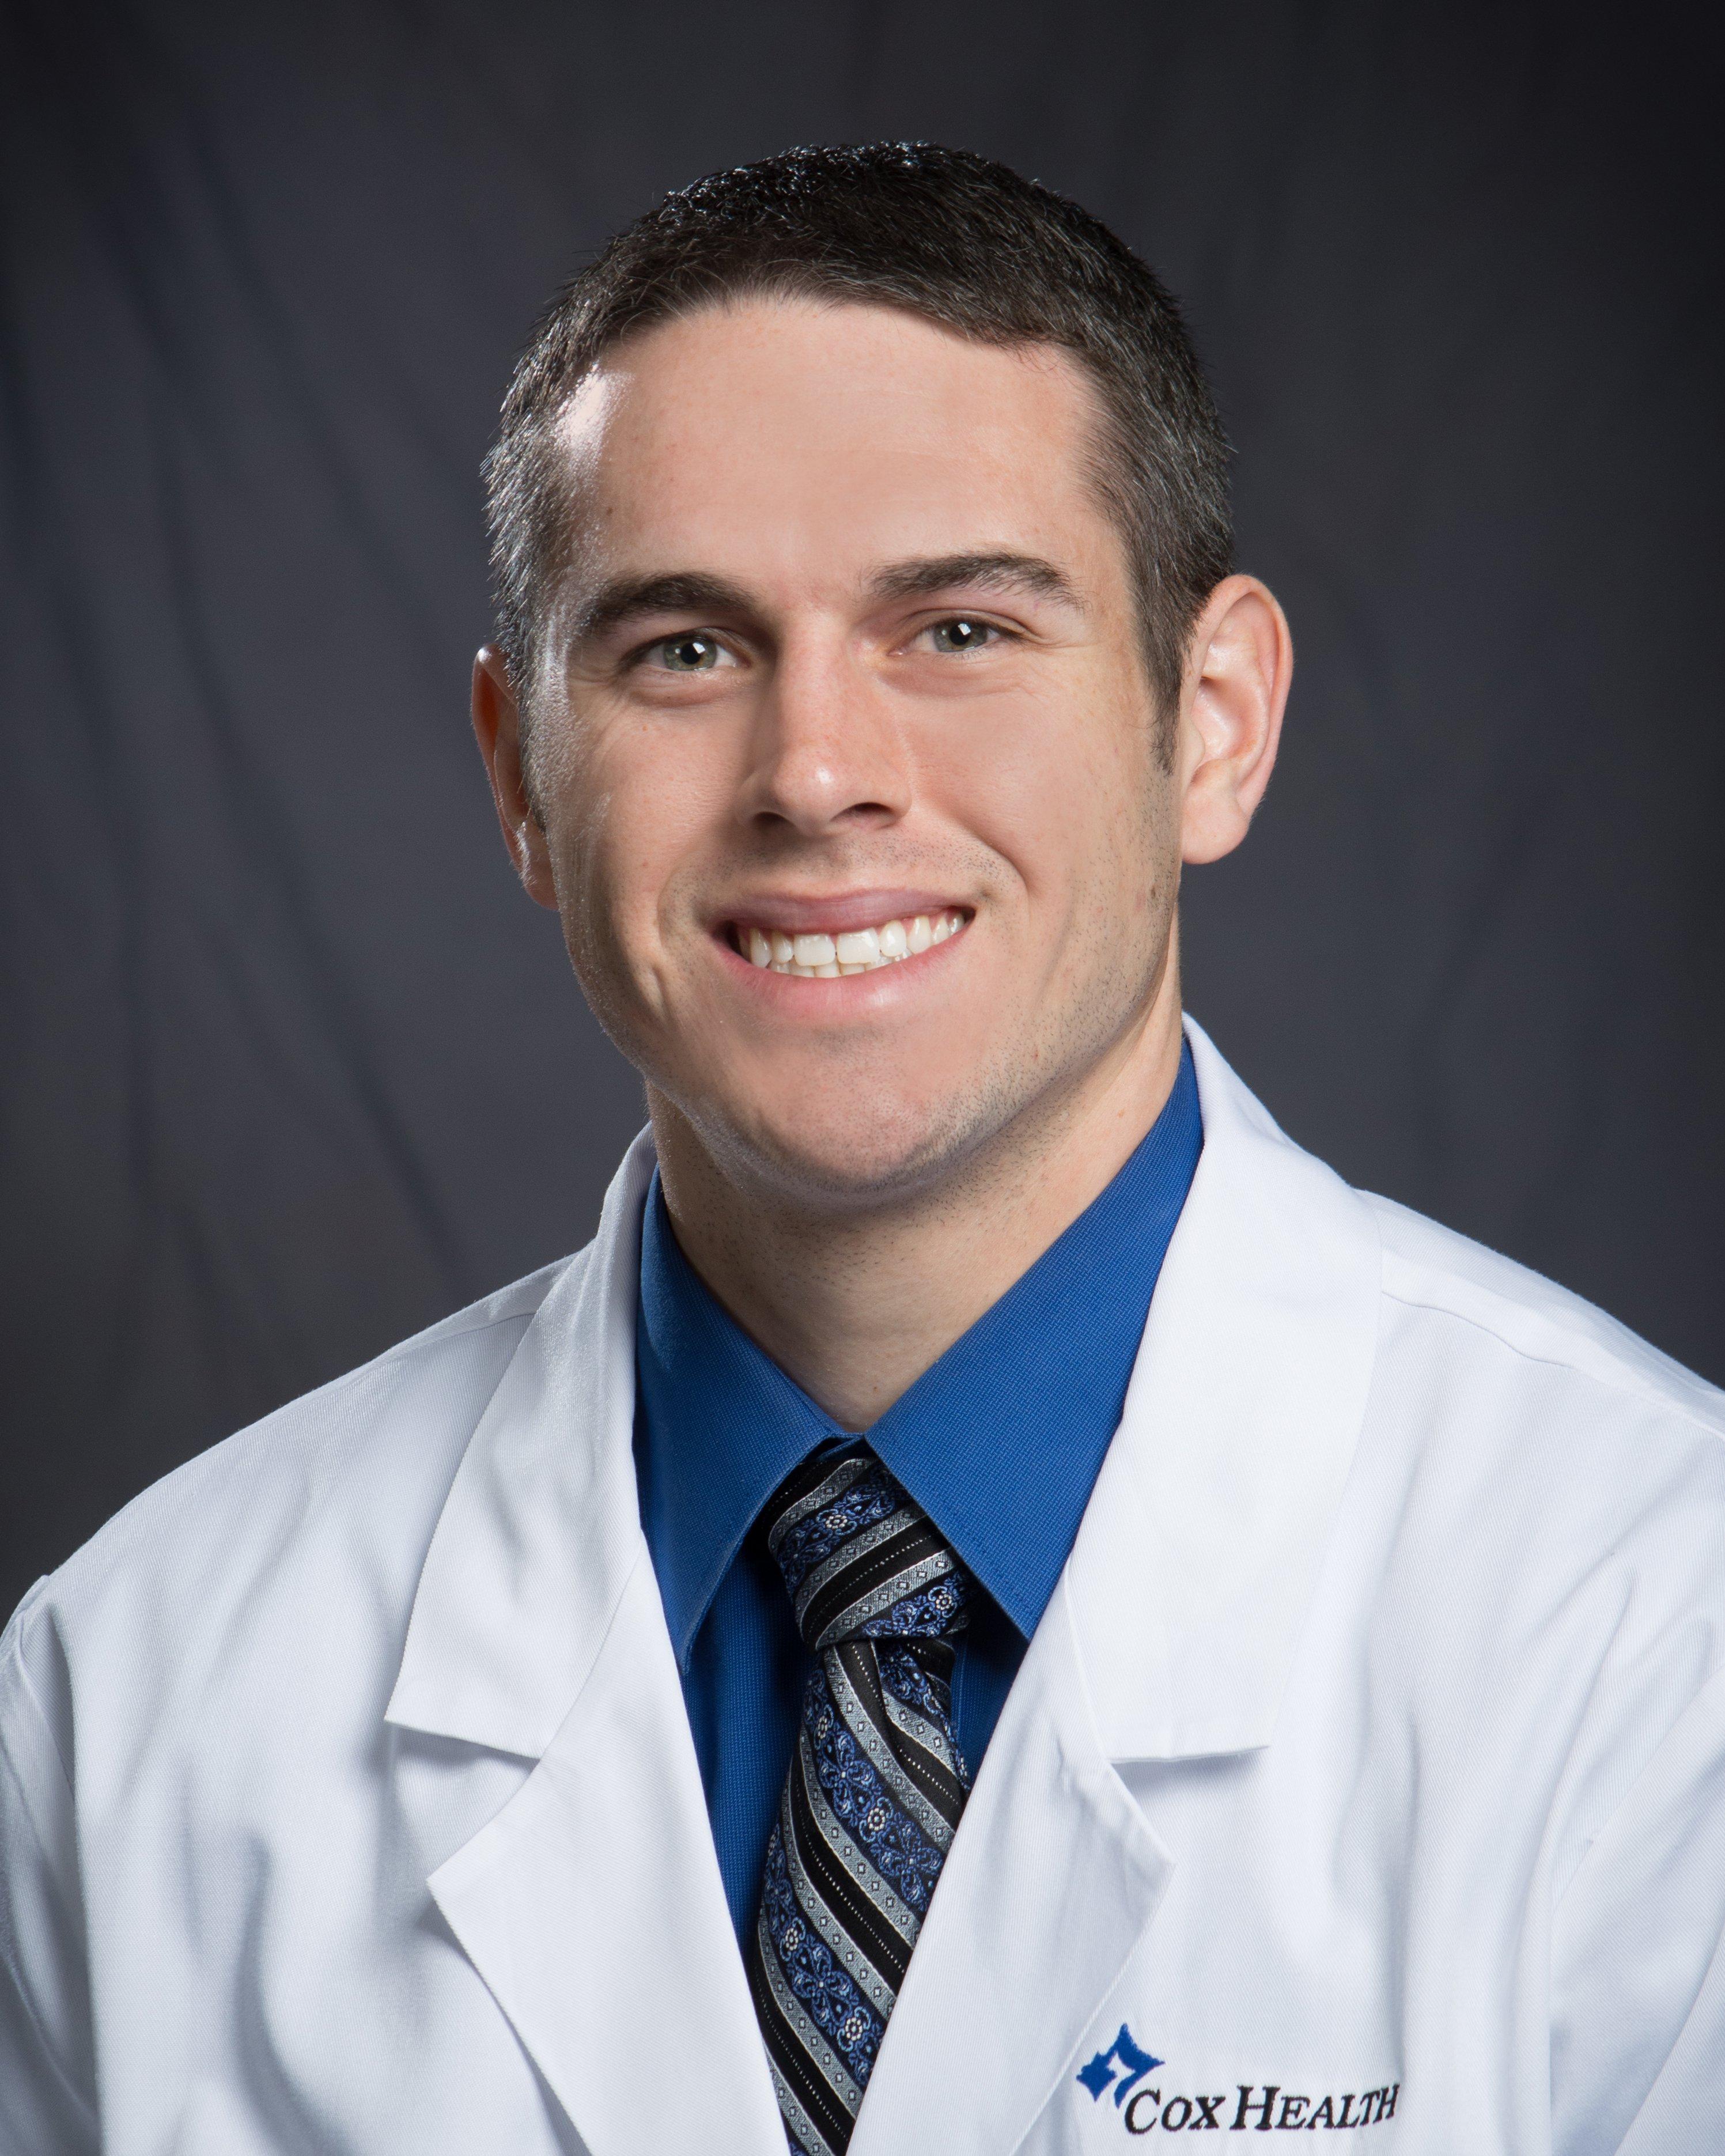 Chris Odehnal, MD